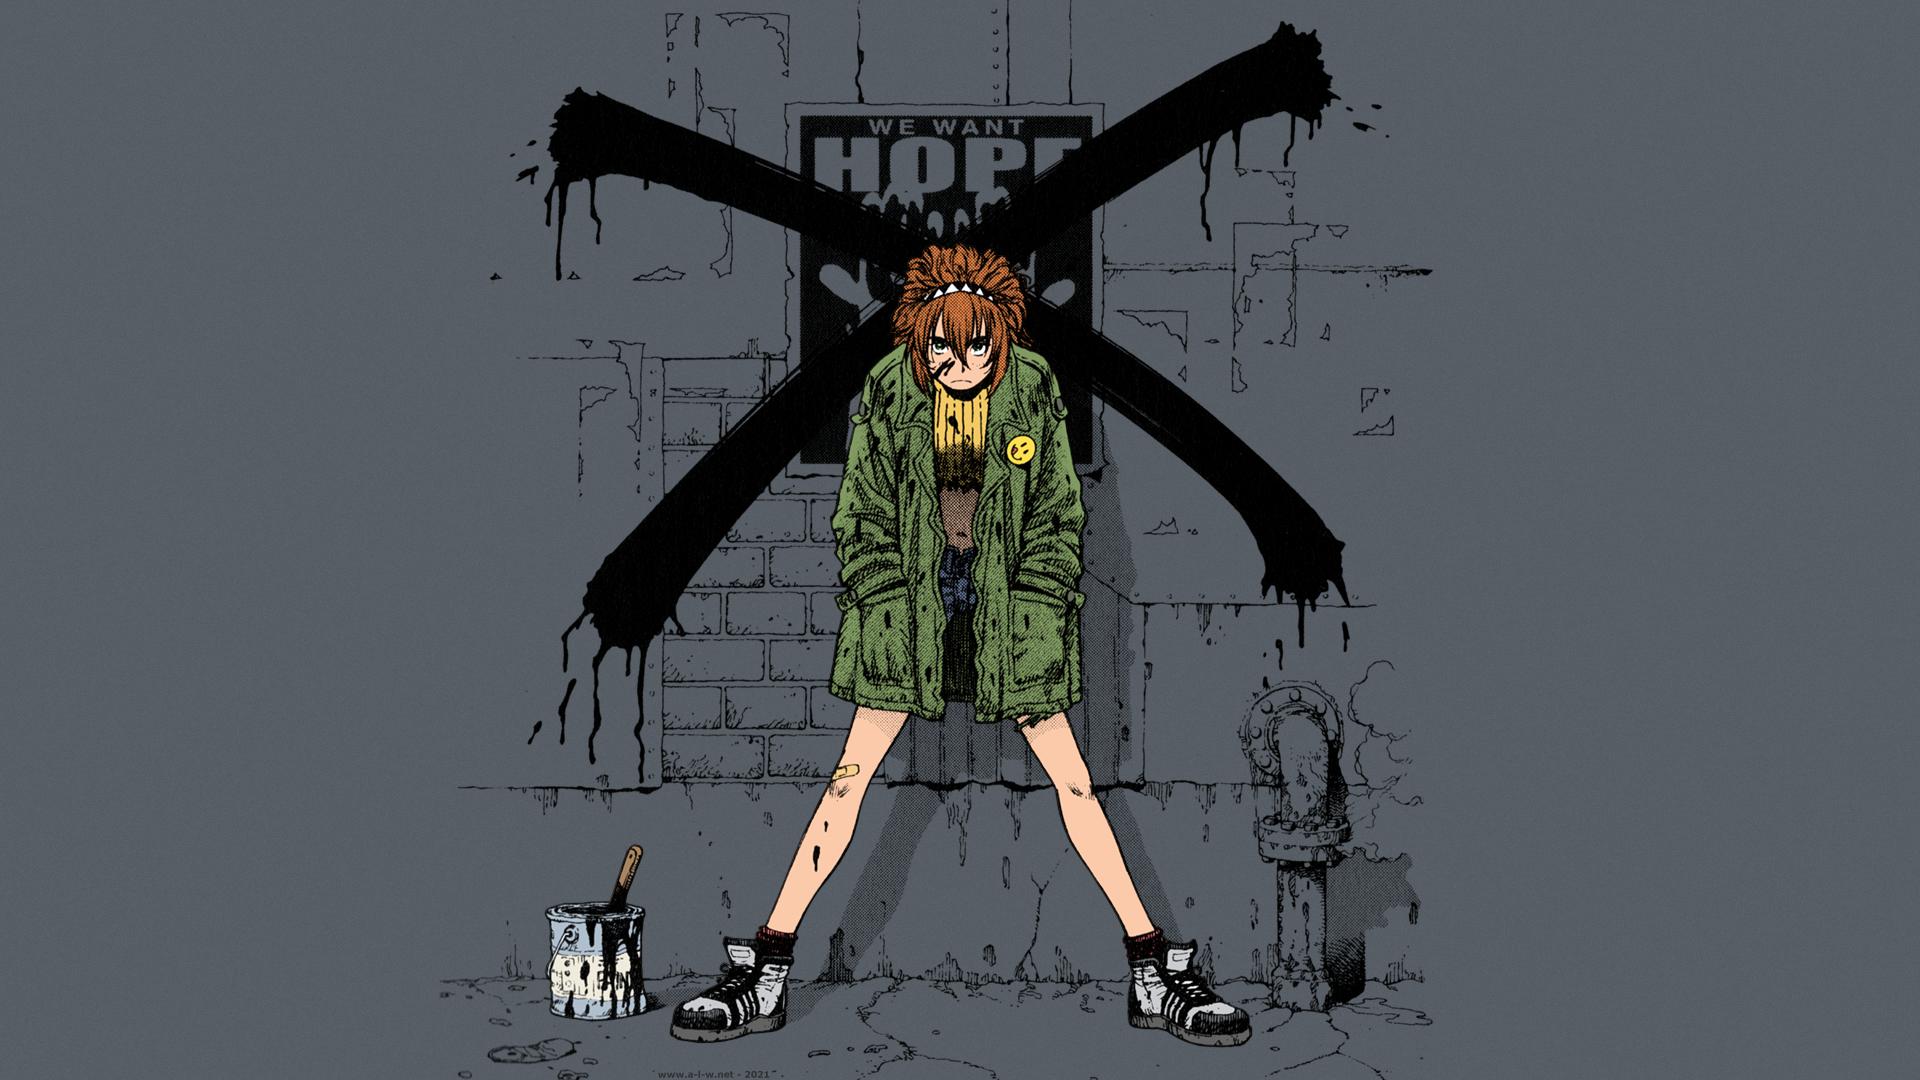 Anime 1920x1080 GUNNM Battle Angel Alita Alita: Battle Angel Koyomi redhead short pants angry short hair anime manga anime girls tomboys